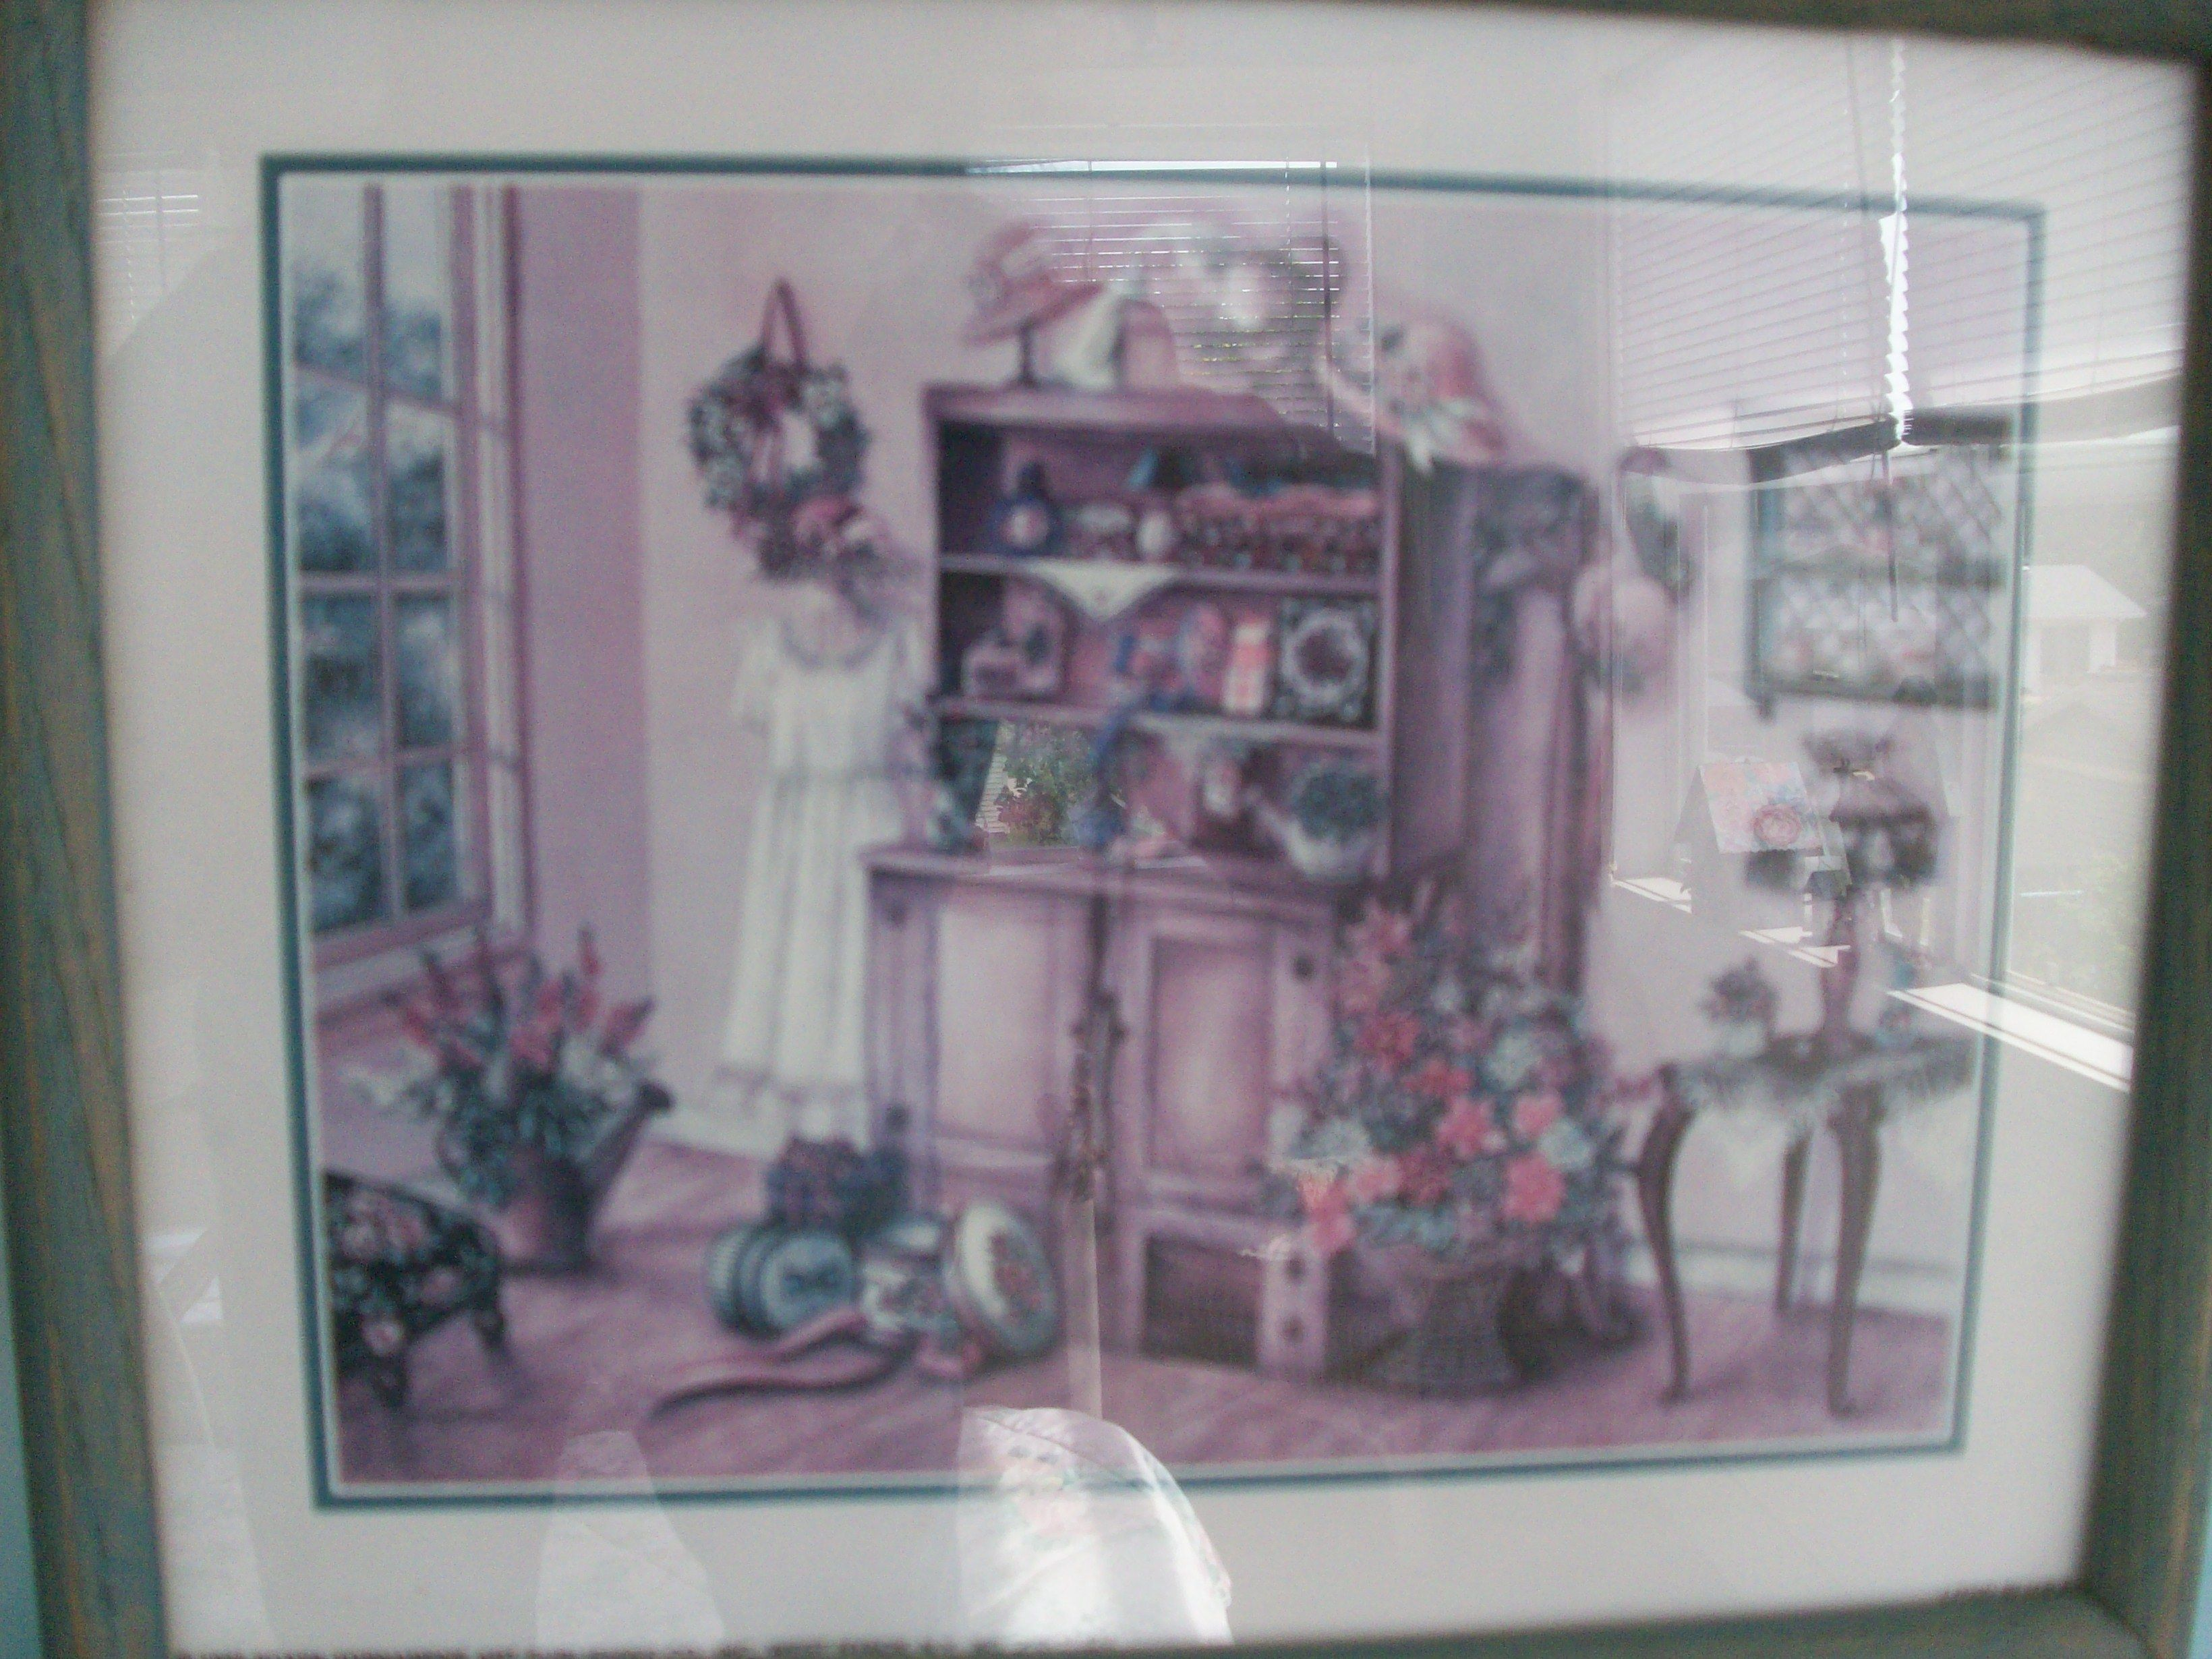 antique cabinet, pretty room